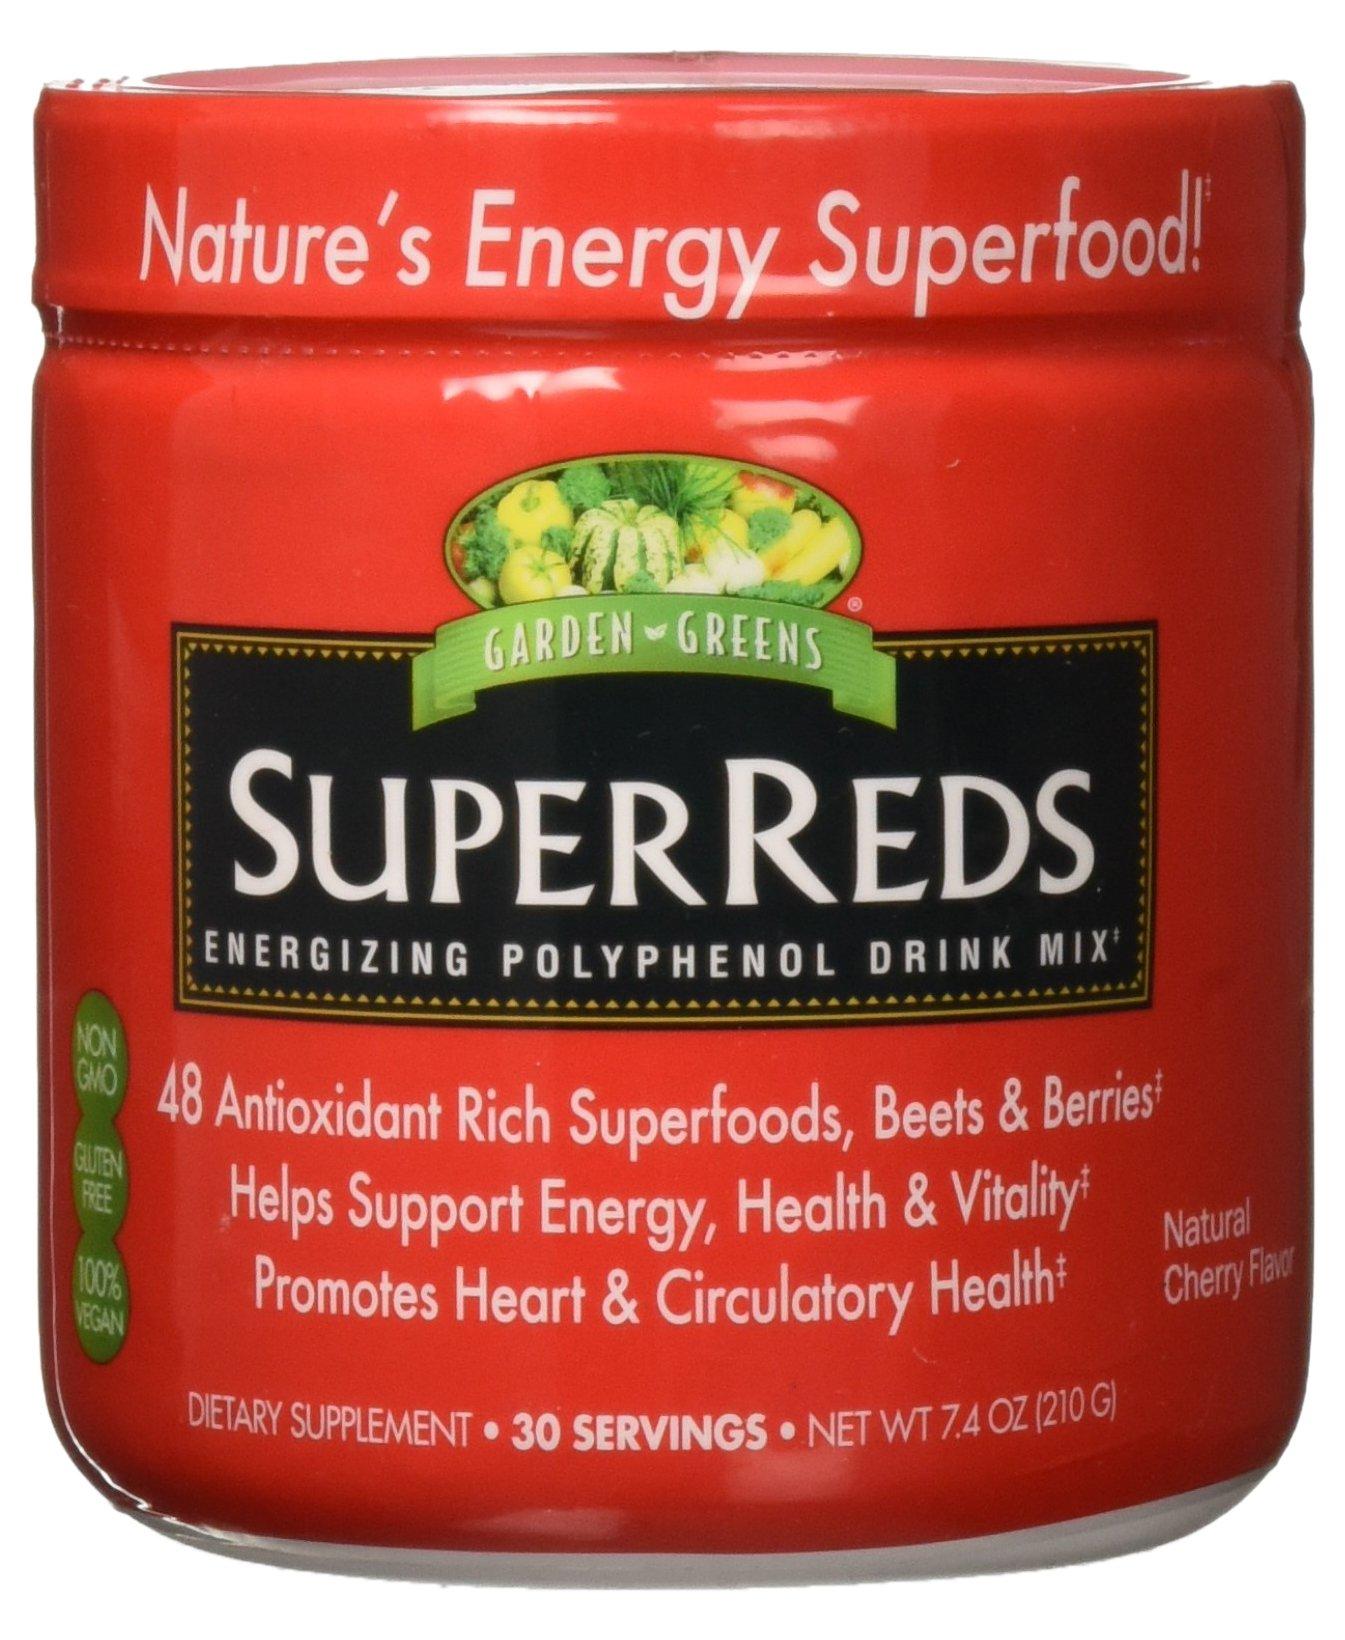 Garden Greens Super Reds Energizing Polyphenol Superfoods, Antioxidants, Powder Drink Mix, 30servings by Garden Greens